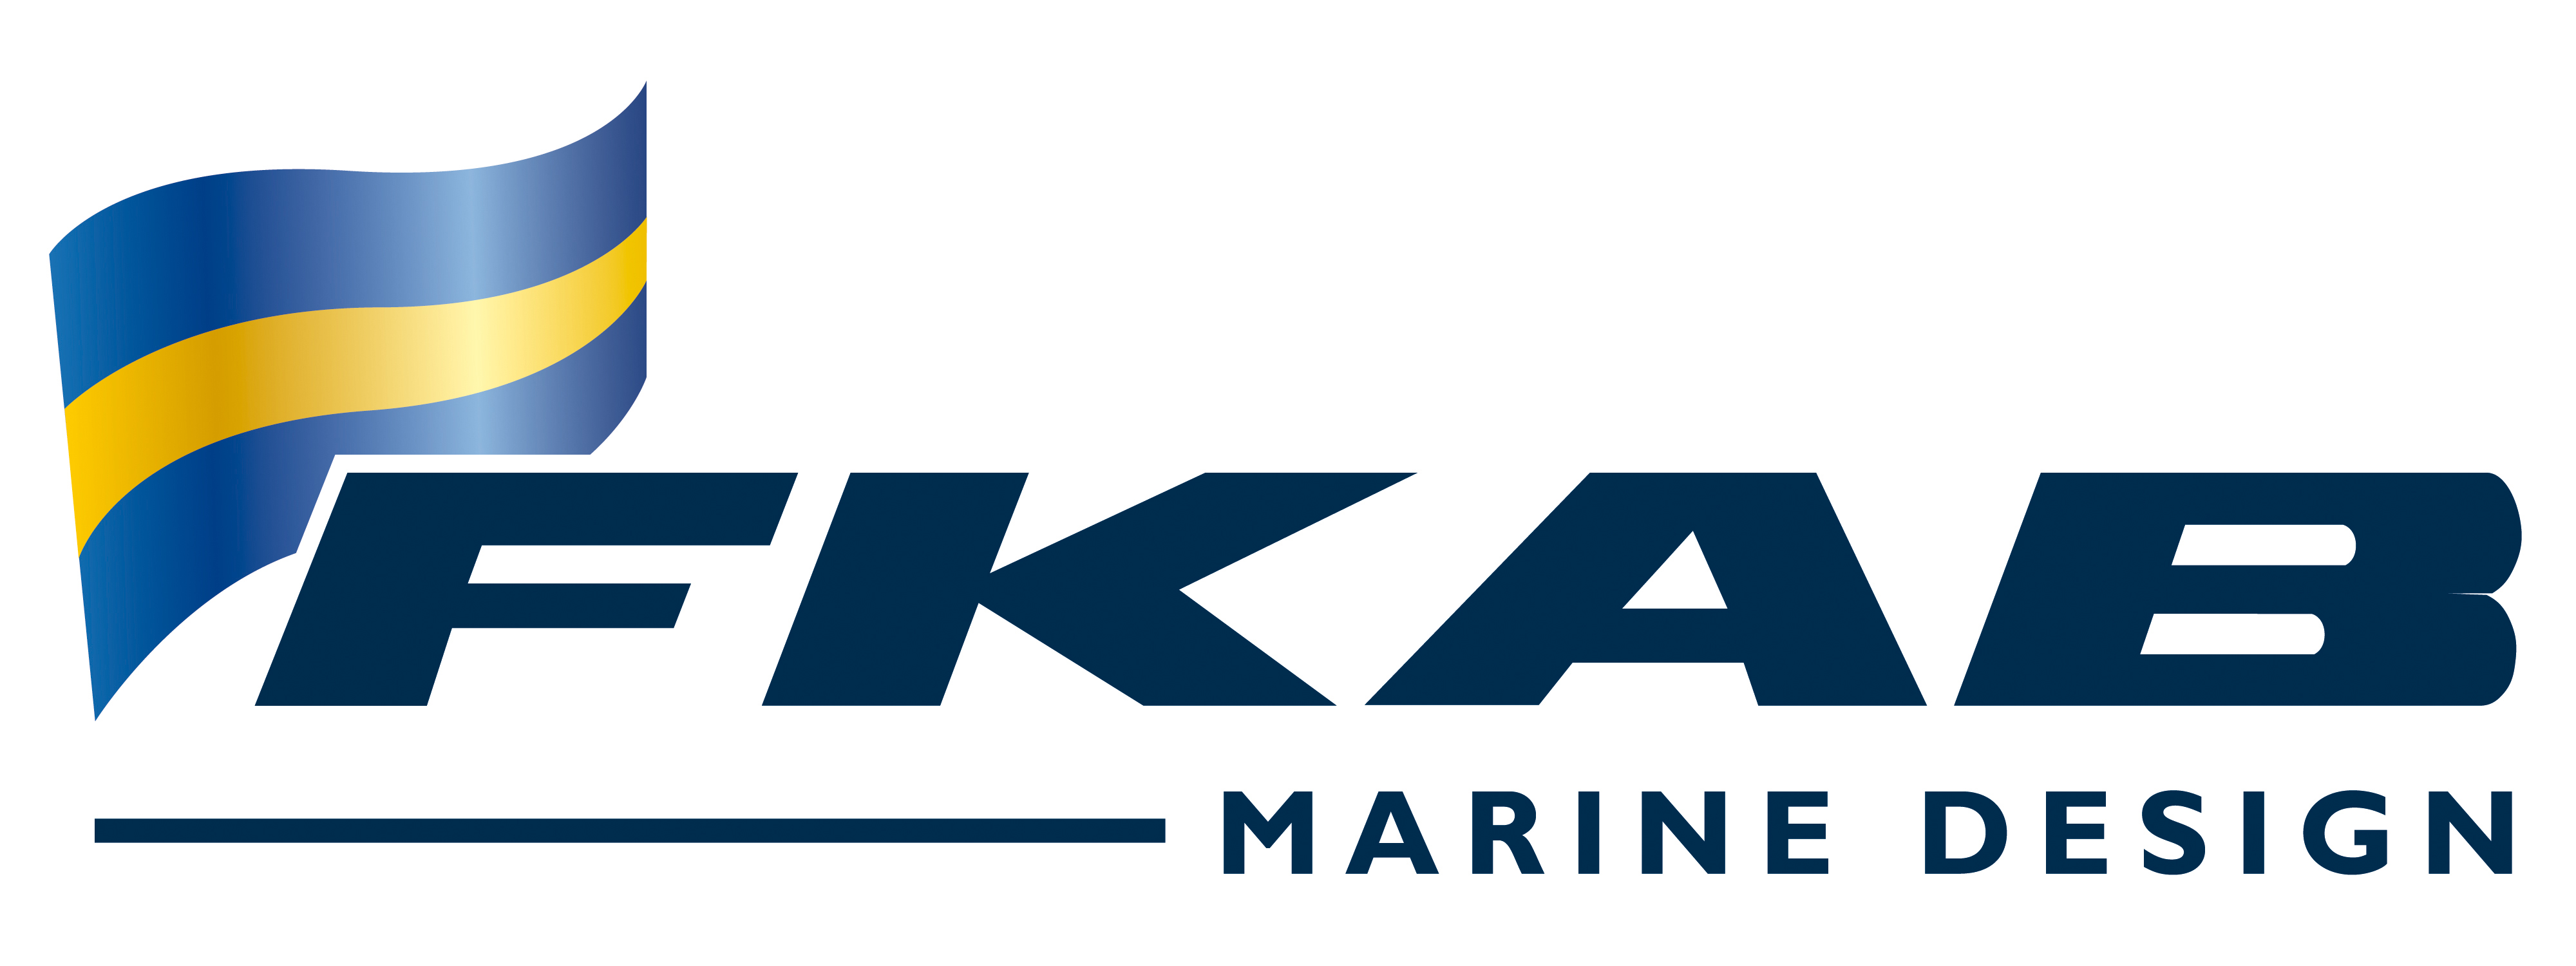 FKAB Marine Design logo